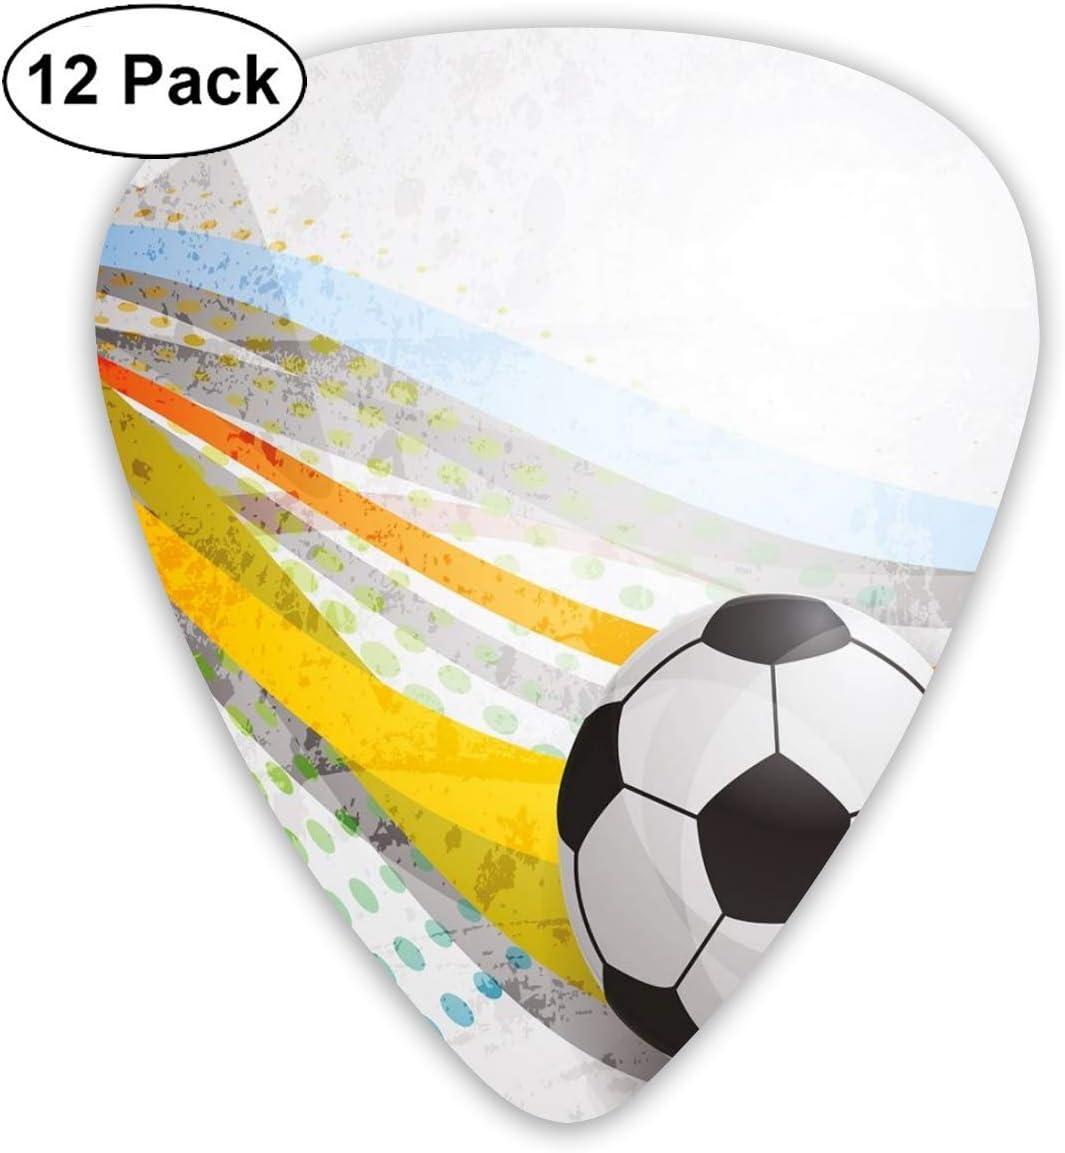 Púas de guitarra Fondo de fútbol con juego de deportes de líneas coloridas de fútbol con pantalla digital, para guitarras acústicas eléctricas bajas-paquete de 12